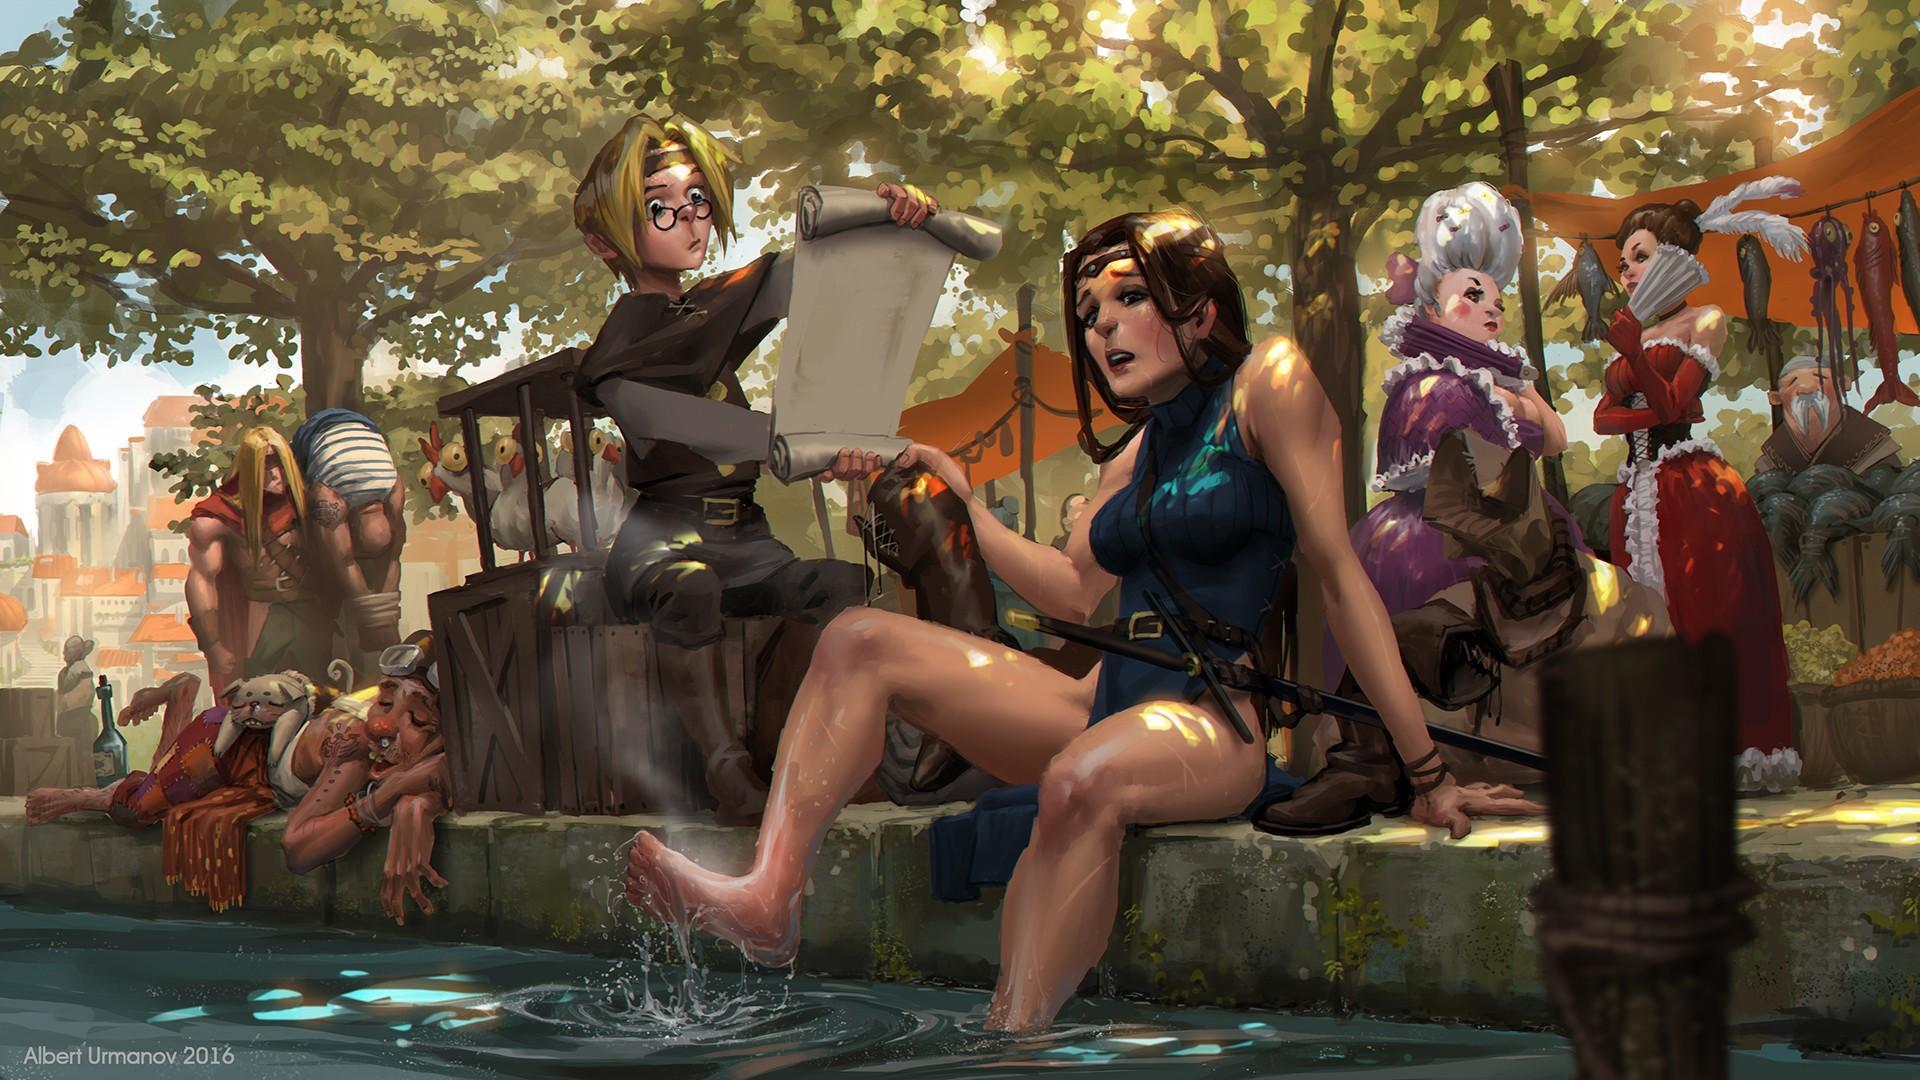 General 1920x1080 fantasy art warrior barefoot humor fantasy girl water Albert Urmanov